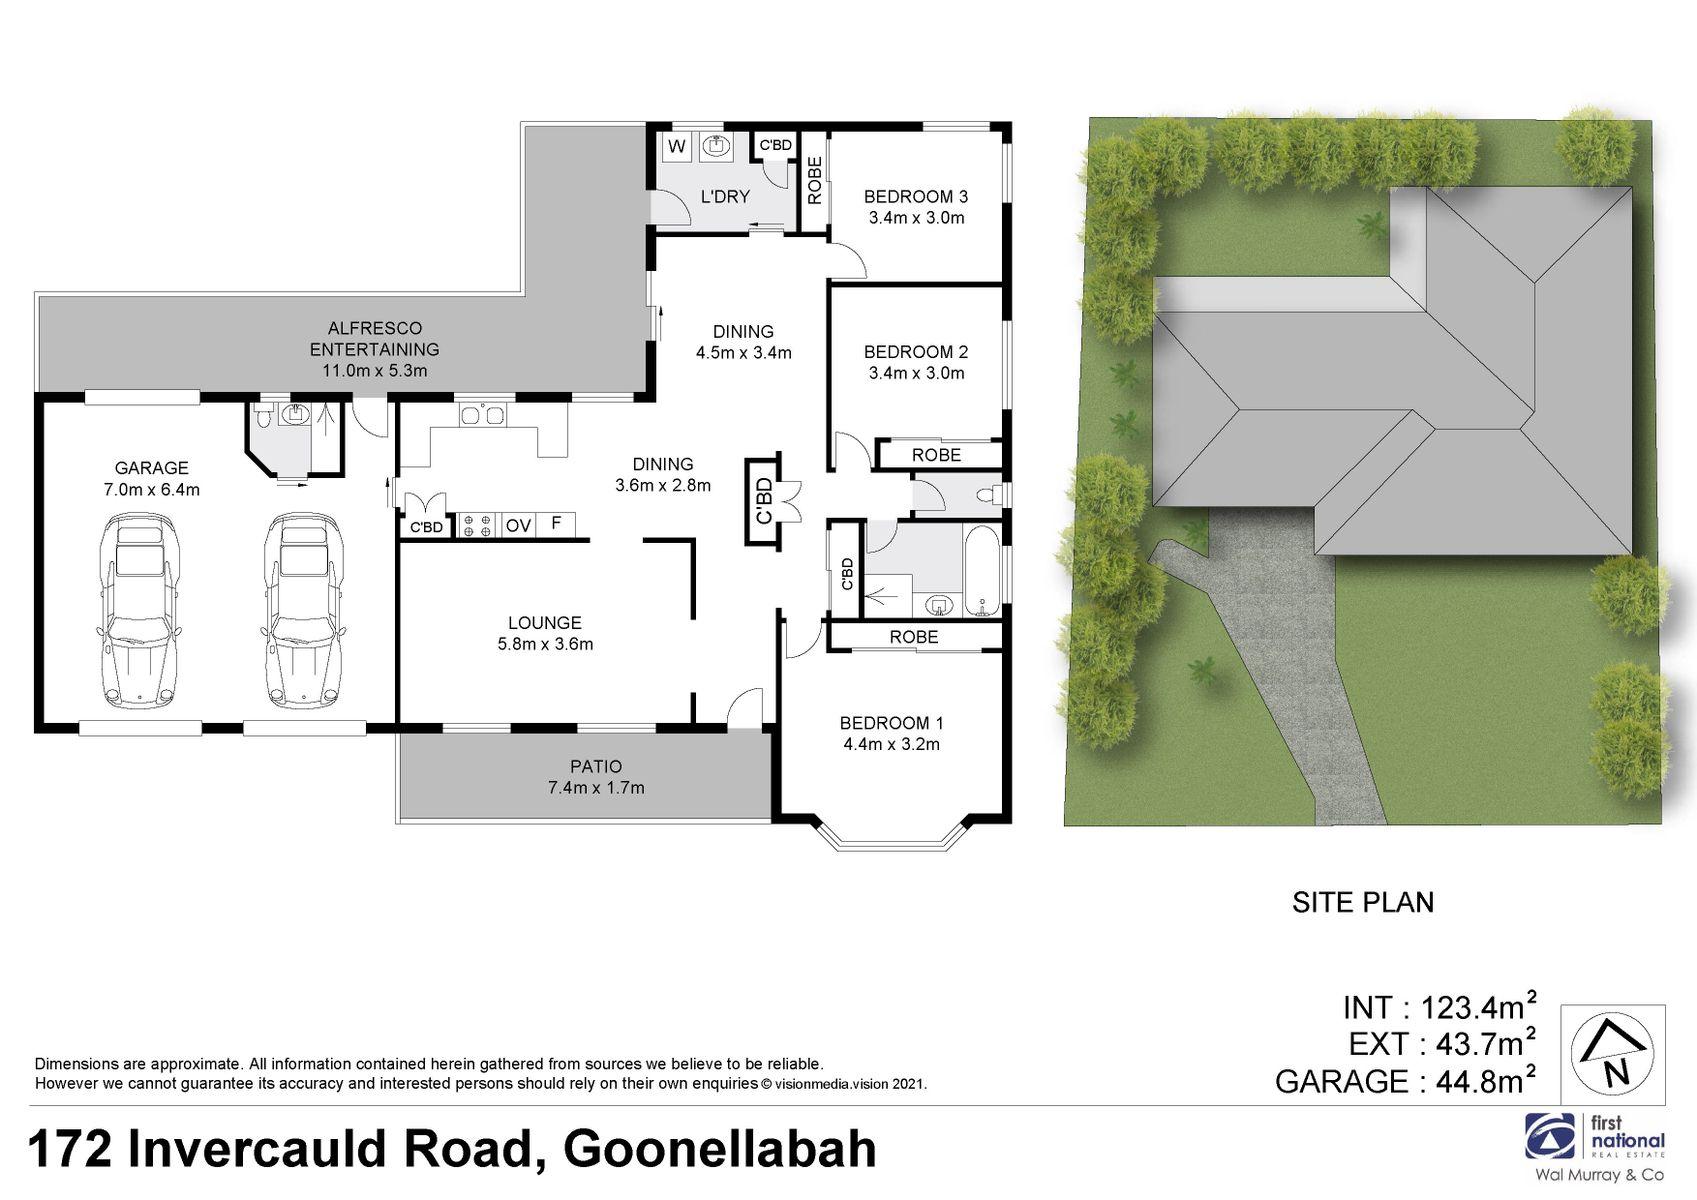 172 Invercauld Road, Goonellabah, NSW 2480